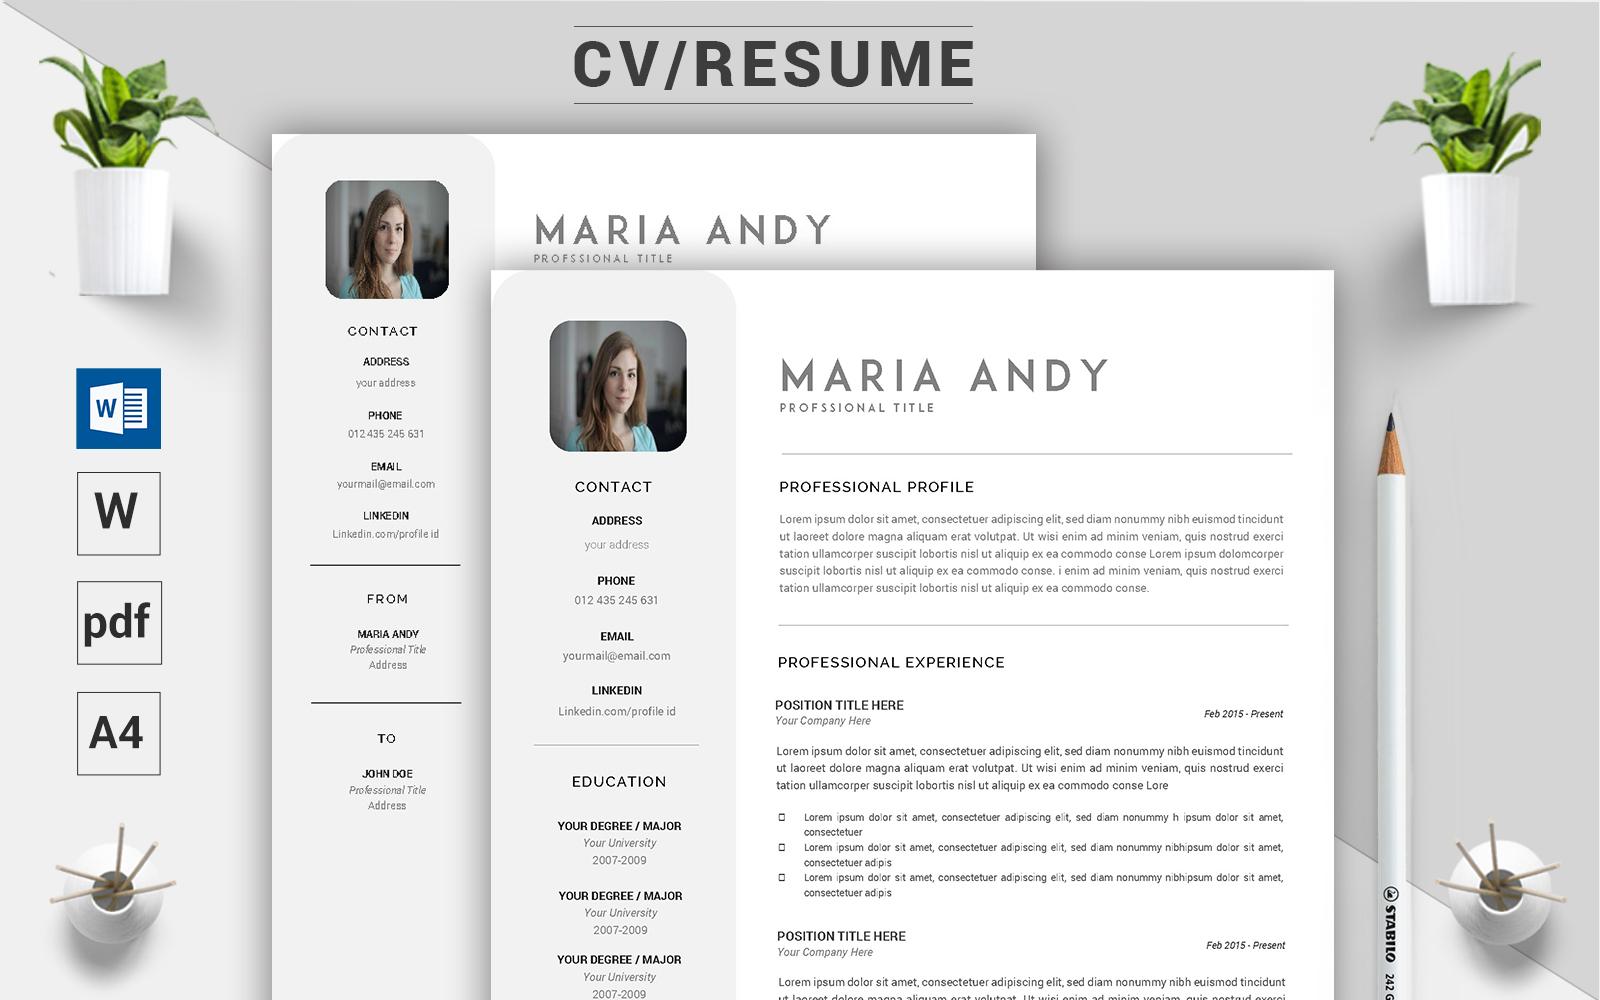 Szablon resume Maria Andy - CV #124493